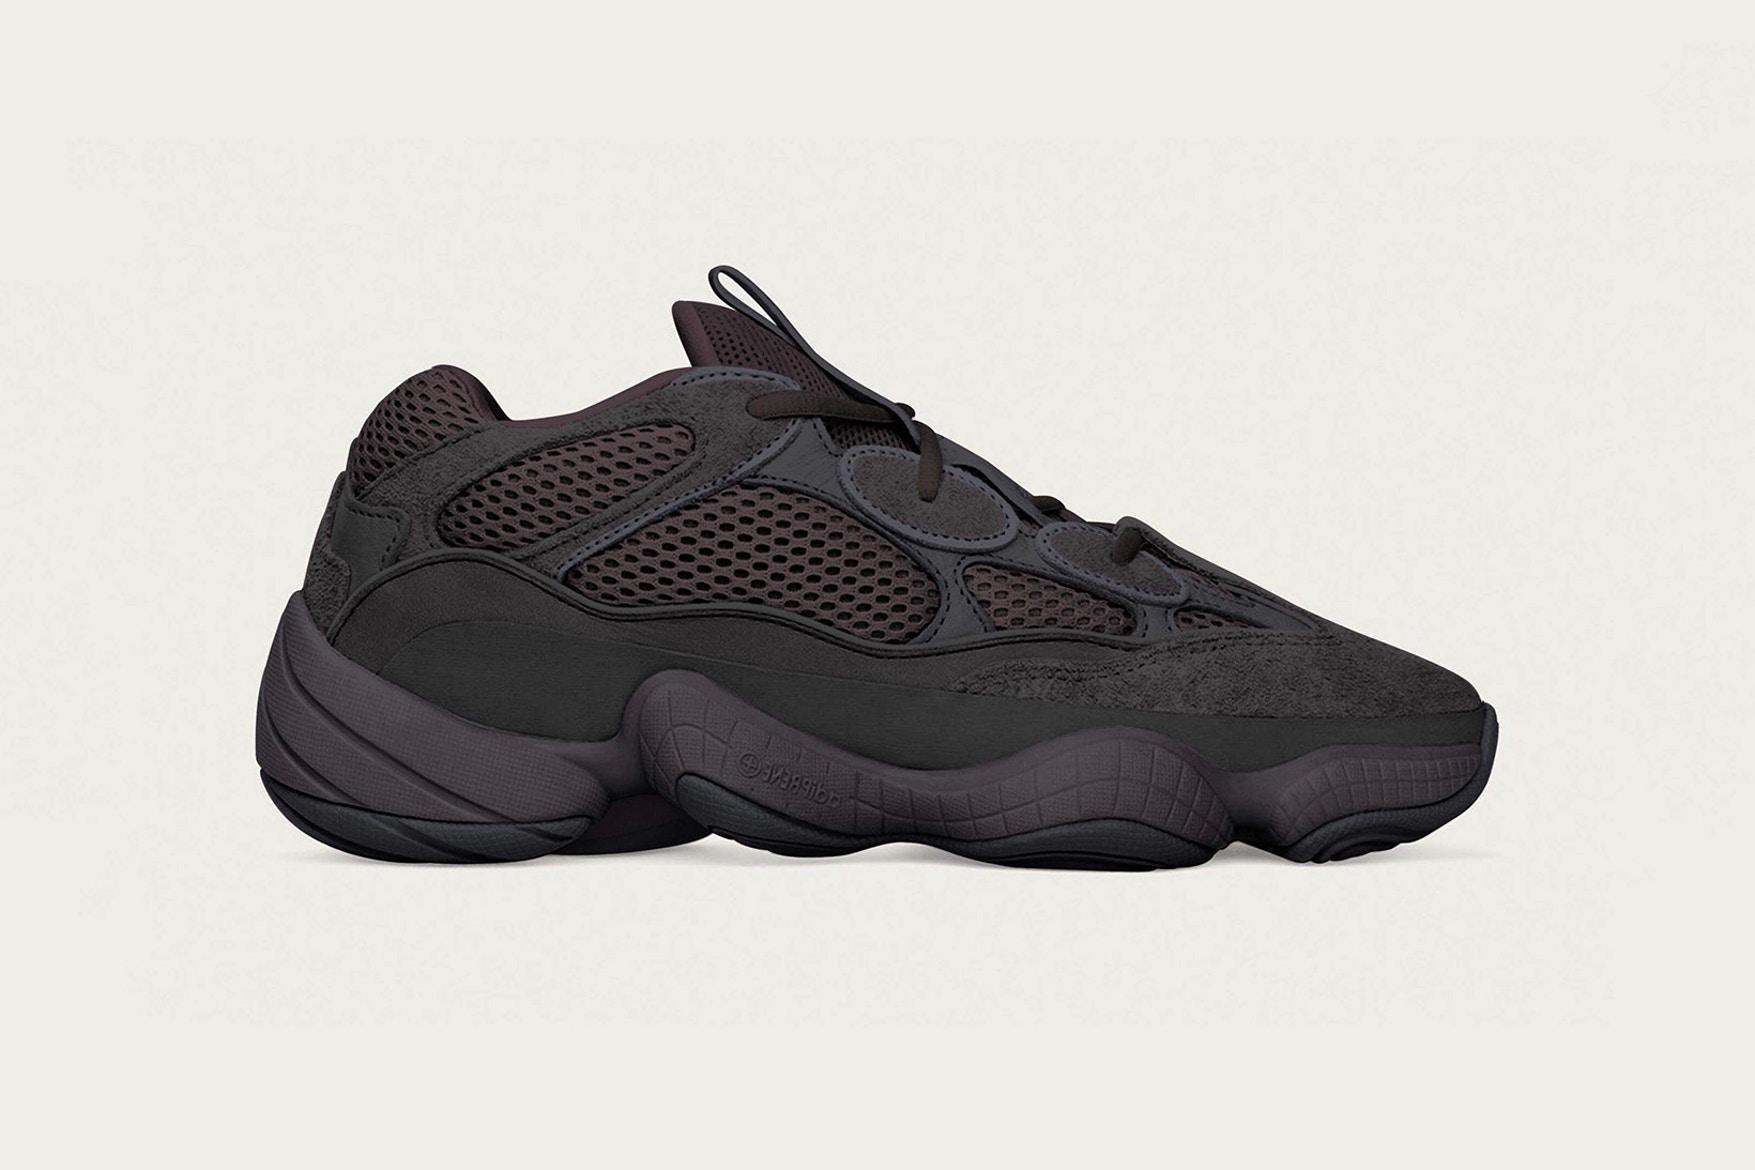 adidas YEEZY 500 в расцветке Utility Black